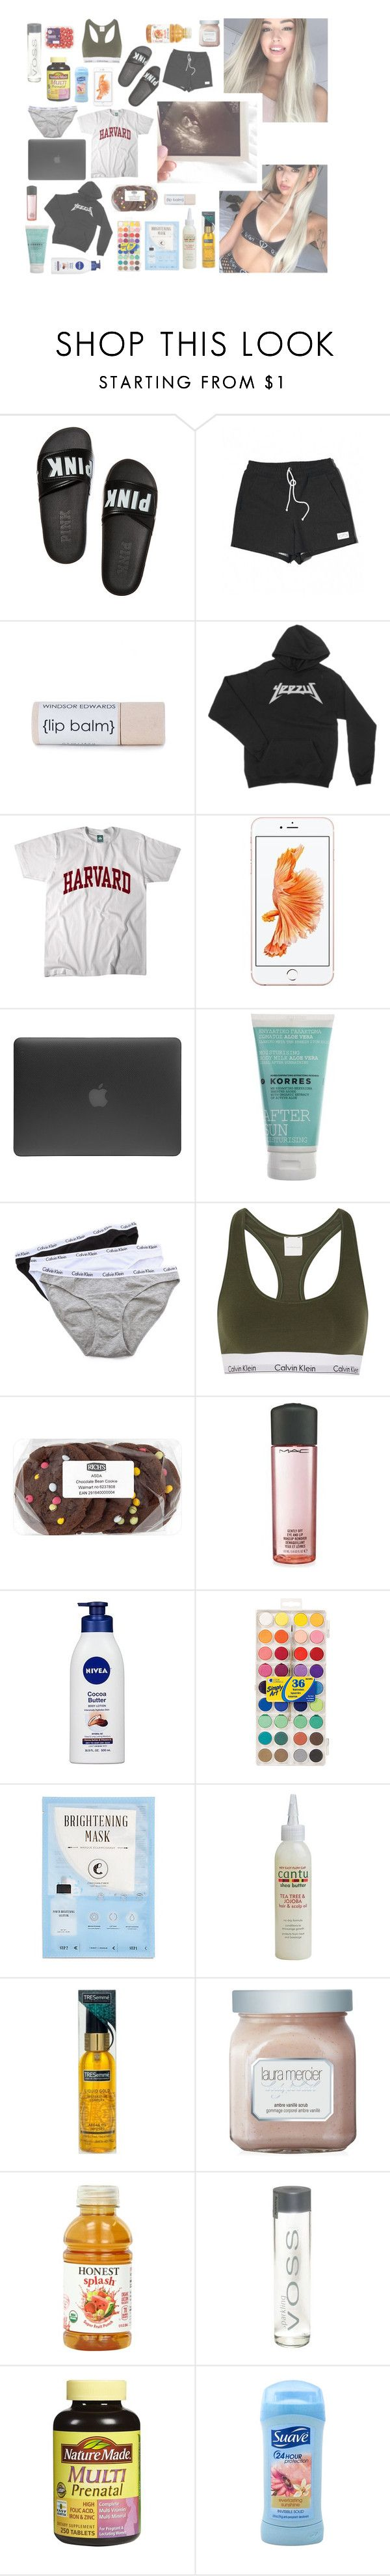 """first ultrasound! | rosie"" by t-eddybear ❤ liked on Polyvore featuring Victoria's Secret, Incase, Korres, Calvin Klein Underwear, MAC Cosmetics, Nivea, Kocostar, TRESemmé, Laura Mercier and Suave"